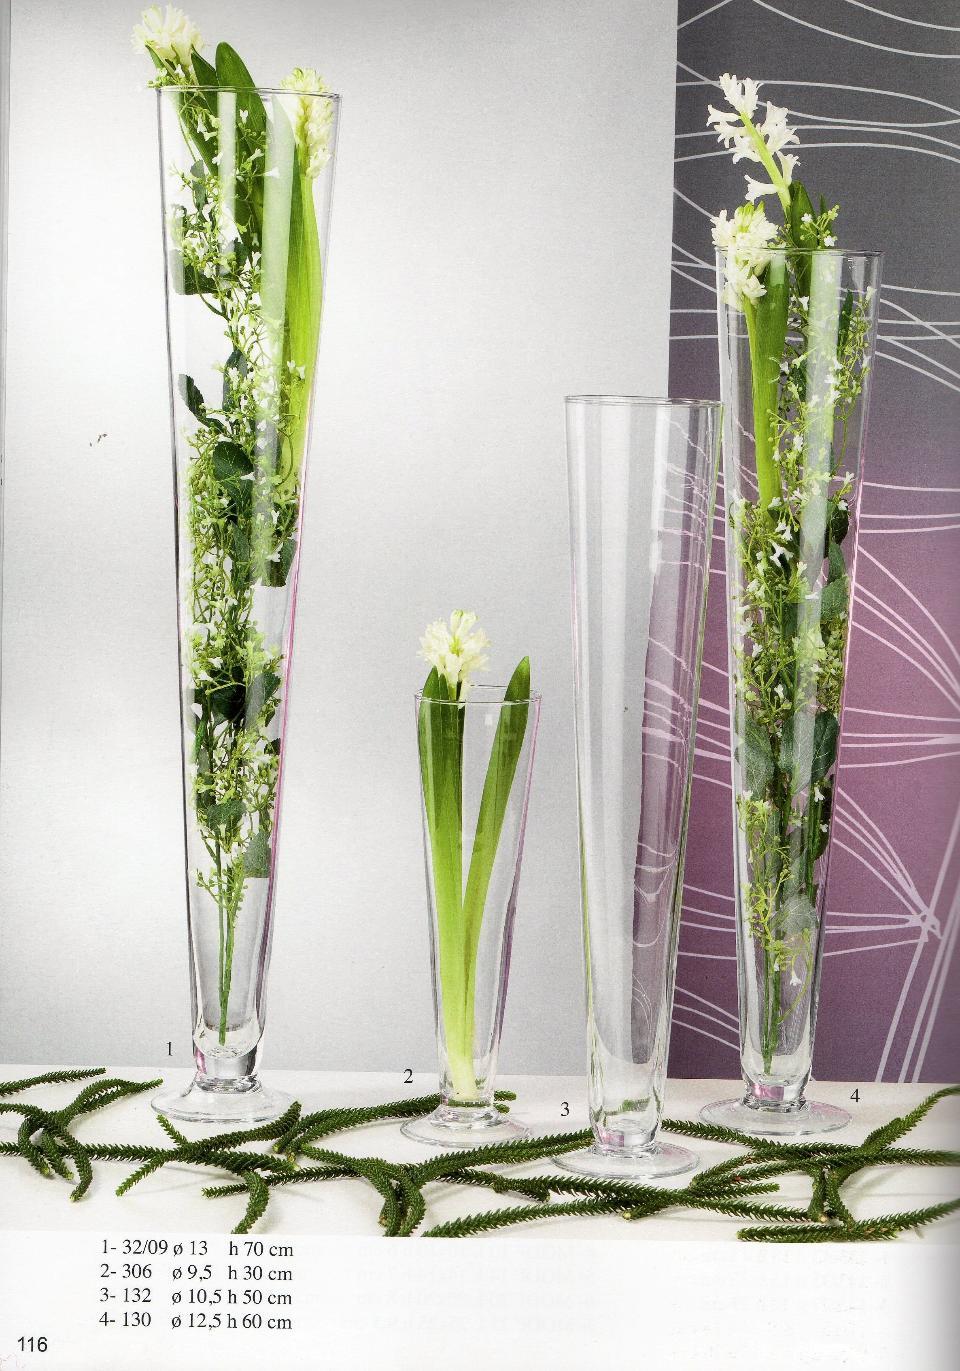 Composizioni floreali in vasi di vetro alti vs42 regardsdefemmes - Vasi moderni alti da interno ...